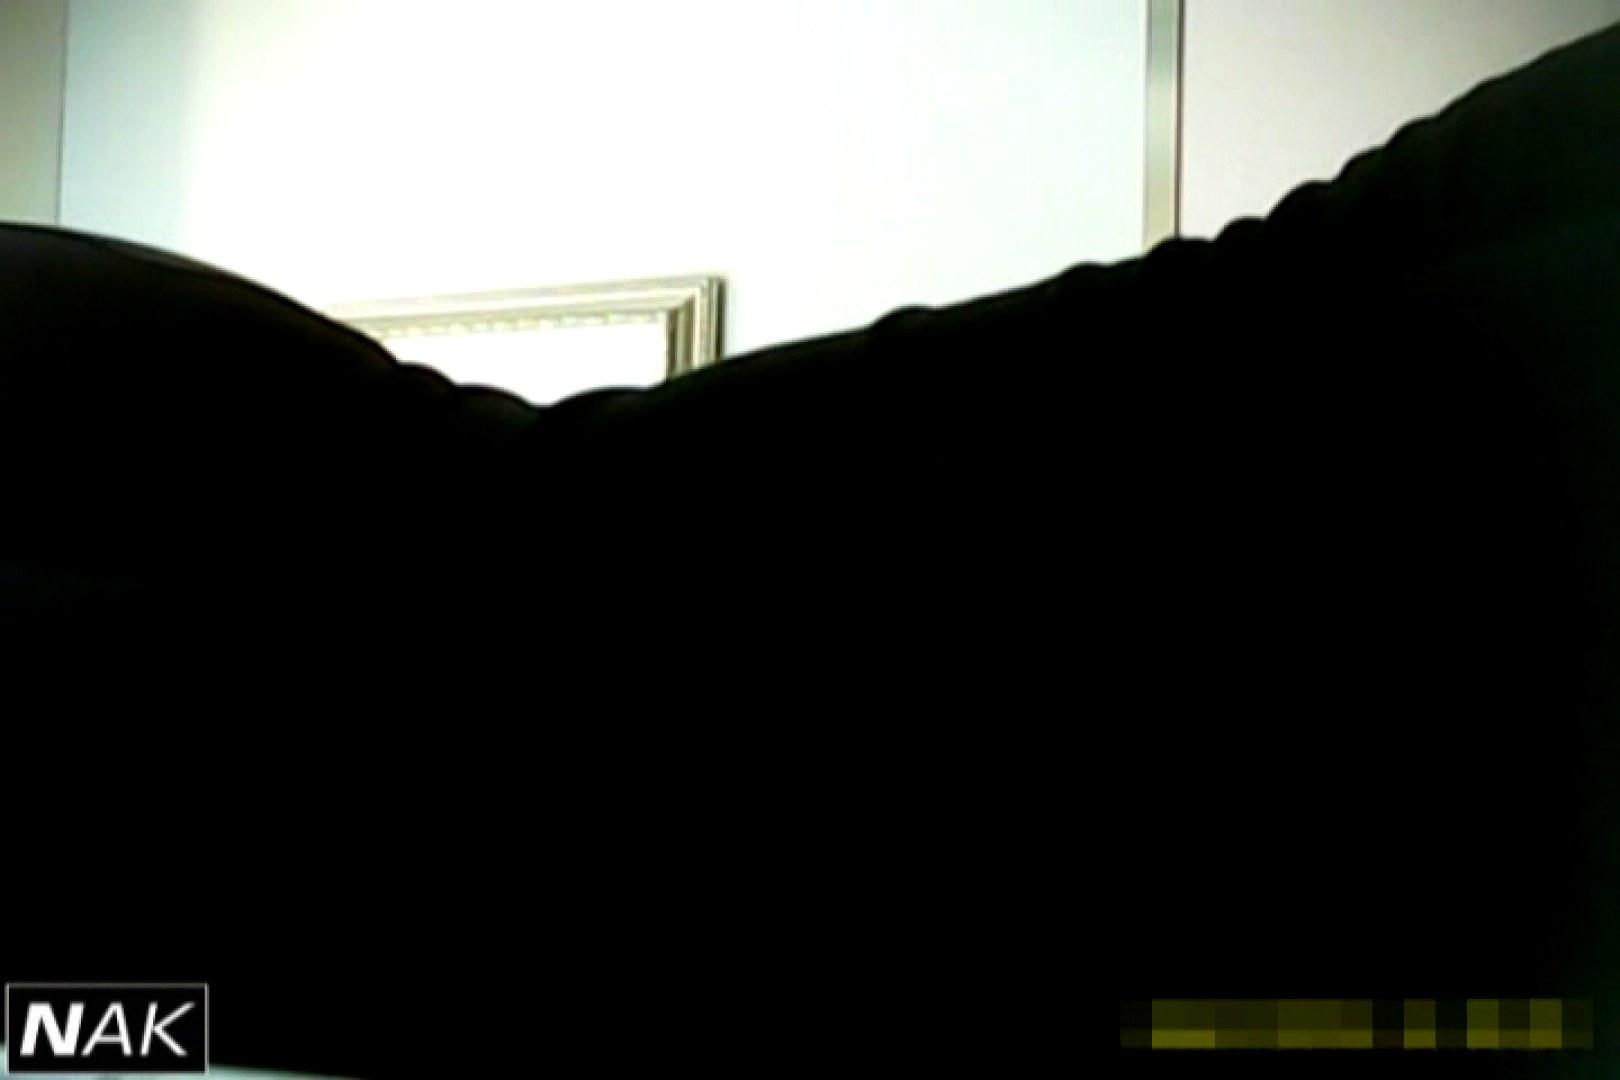 VIP史上初!脅威の3点かわや! vol.08 オマンコ特集 盗み撮り動画 107pic 29